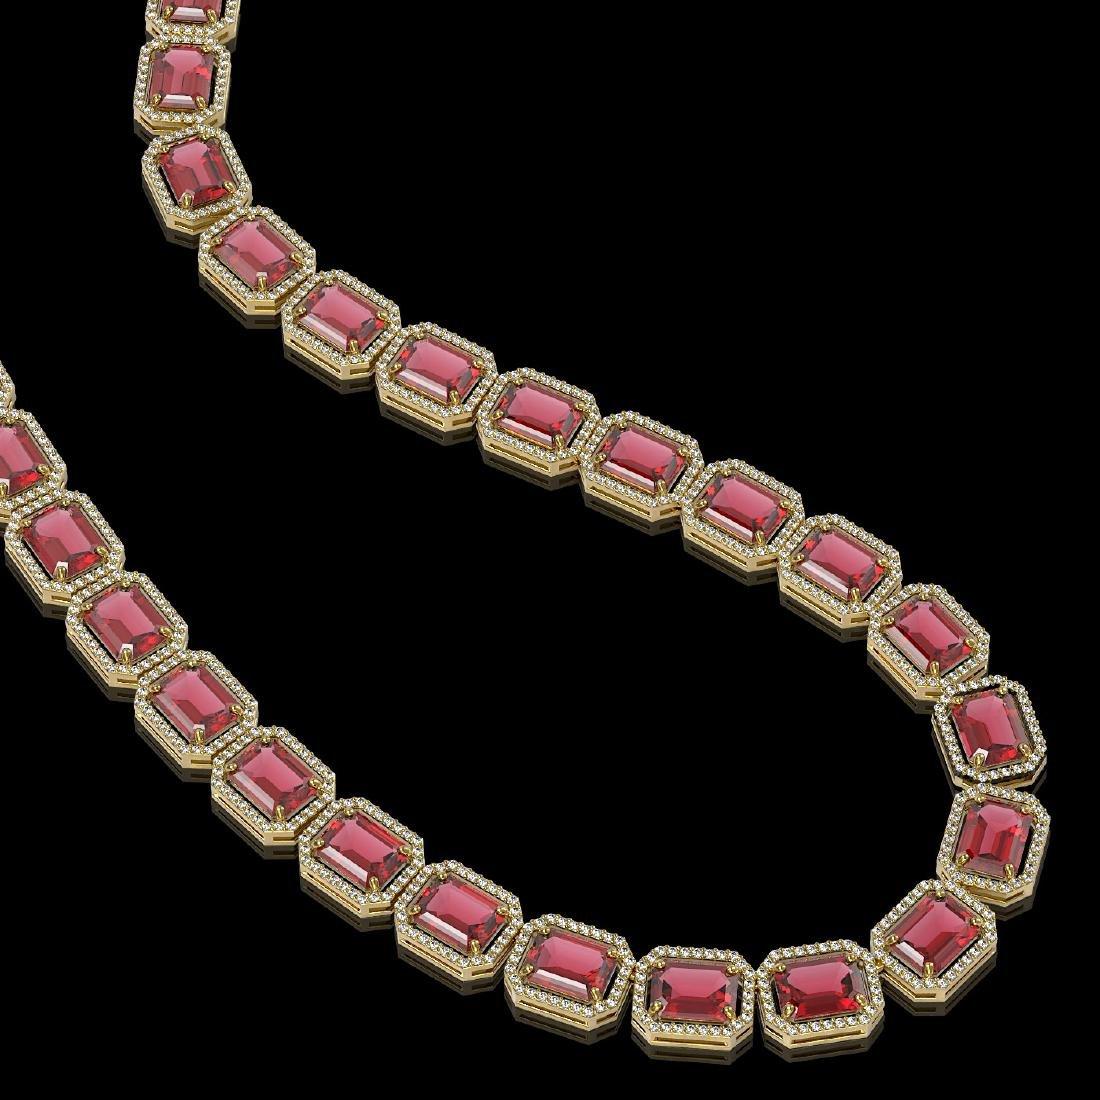 80.32 CTW Tourmaline & Diamond Halo Necklace 10K Yellow - 2